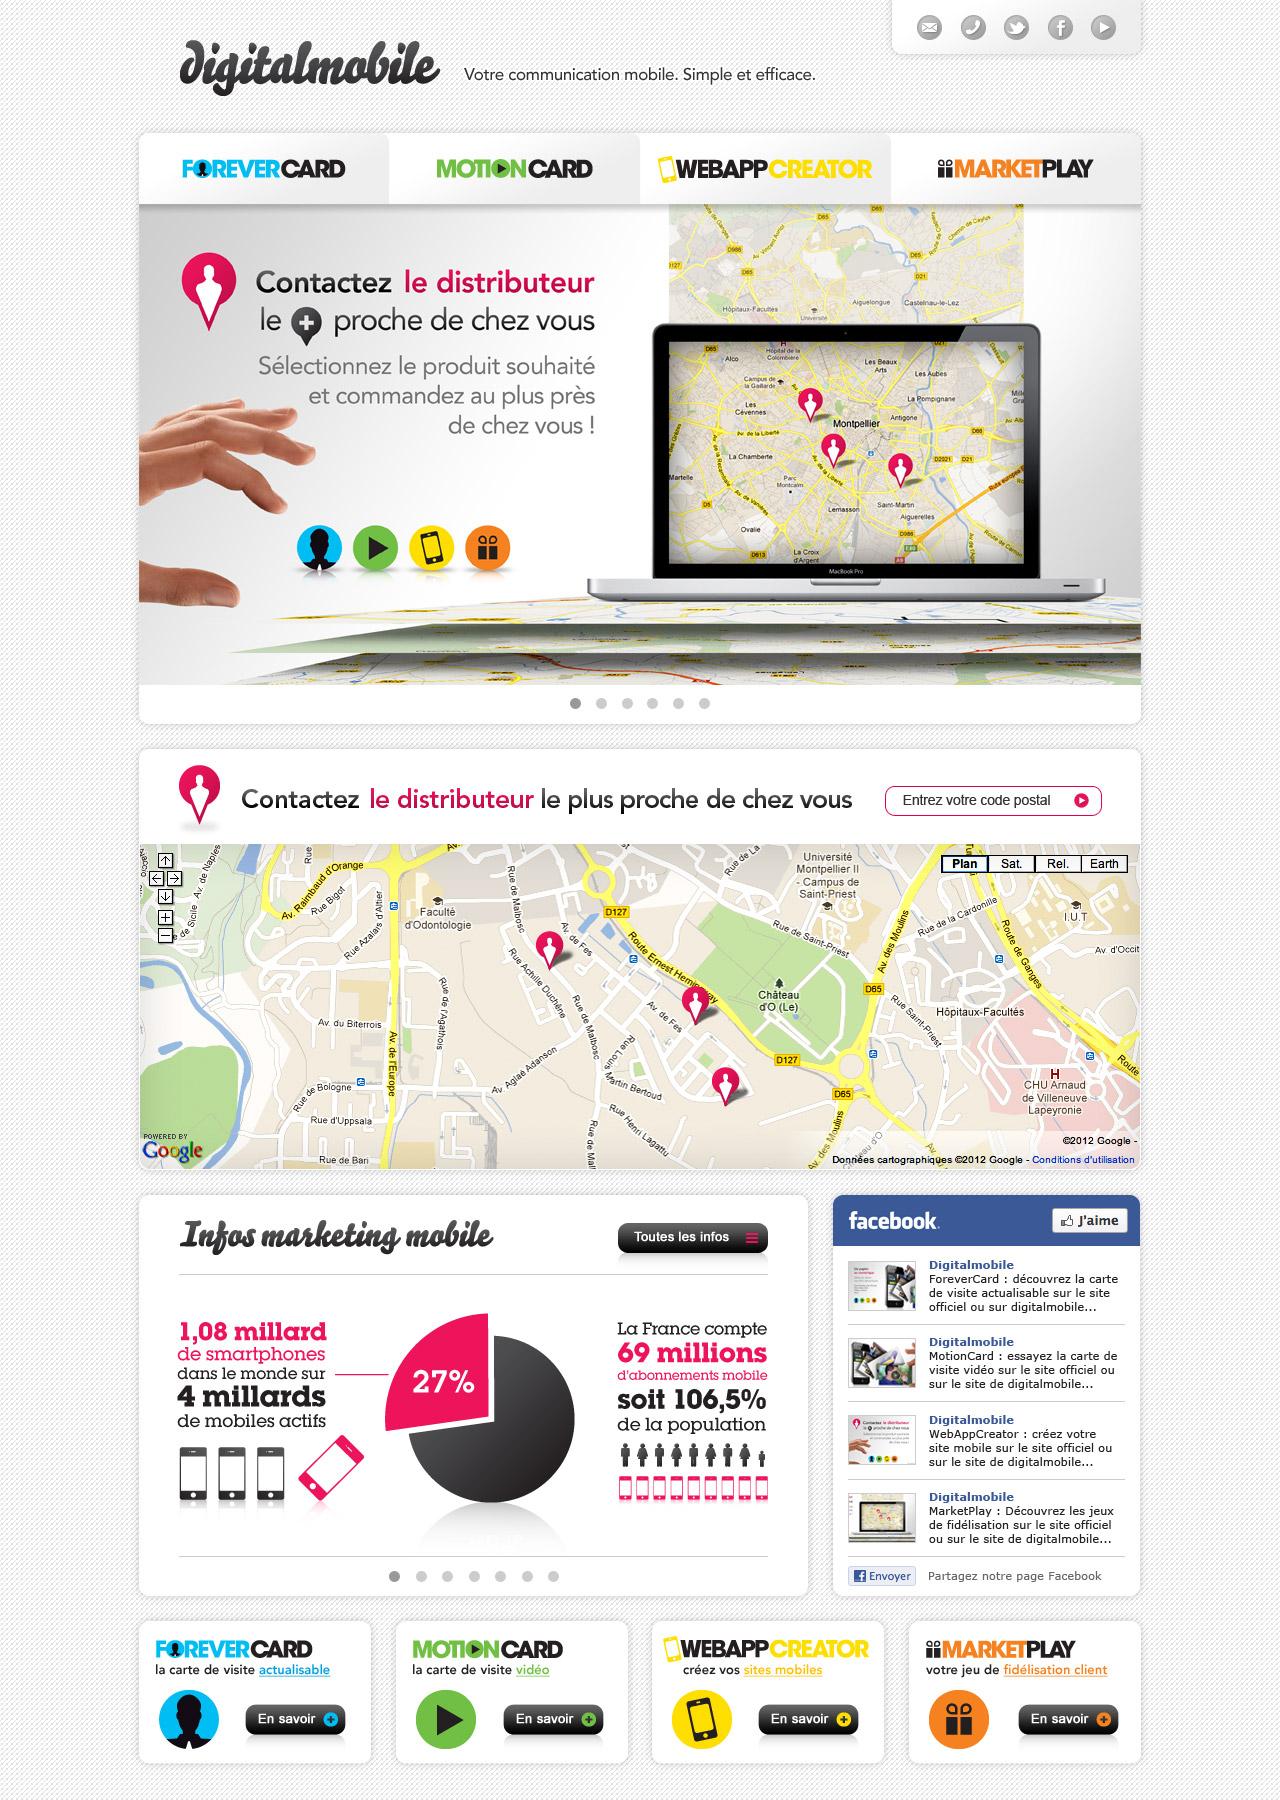 exaprint-digitalmobile-site-internet-global-creation-communication-caconcept-alexis-cretin-graphiste